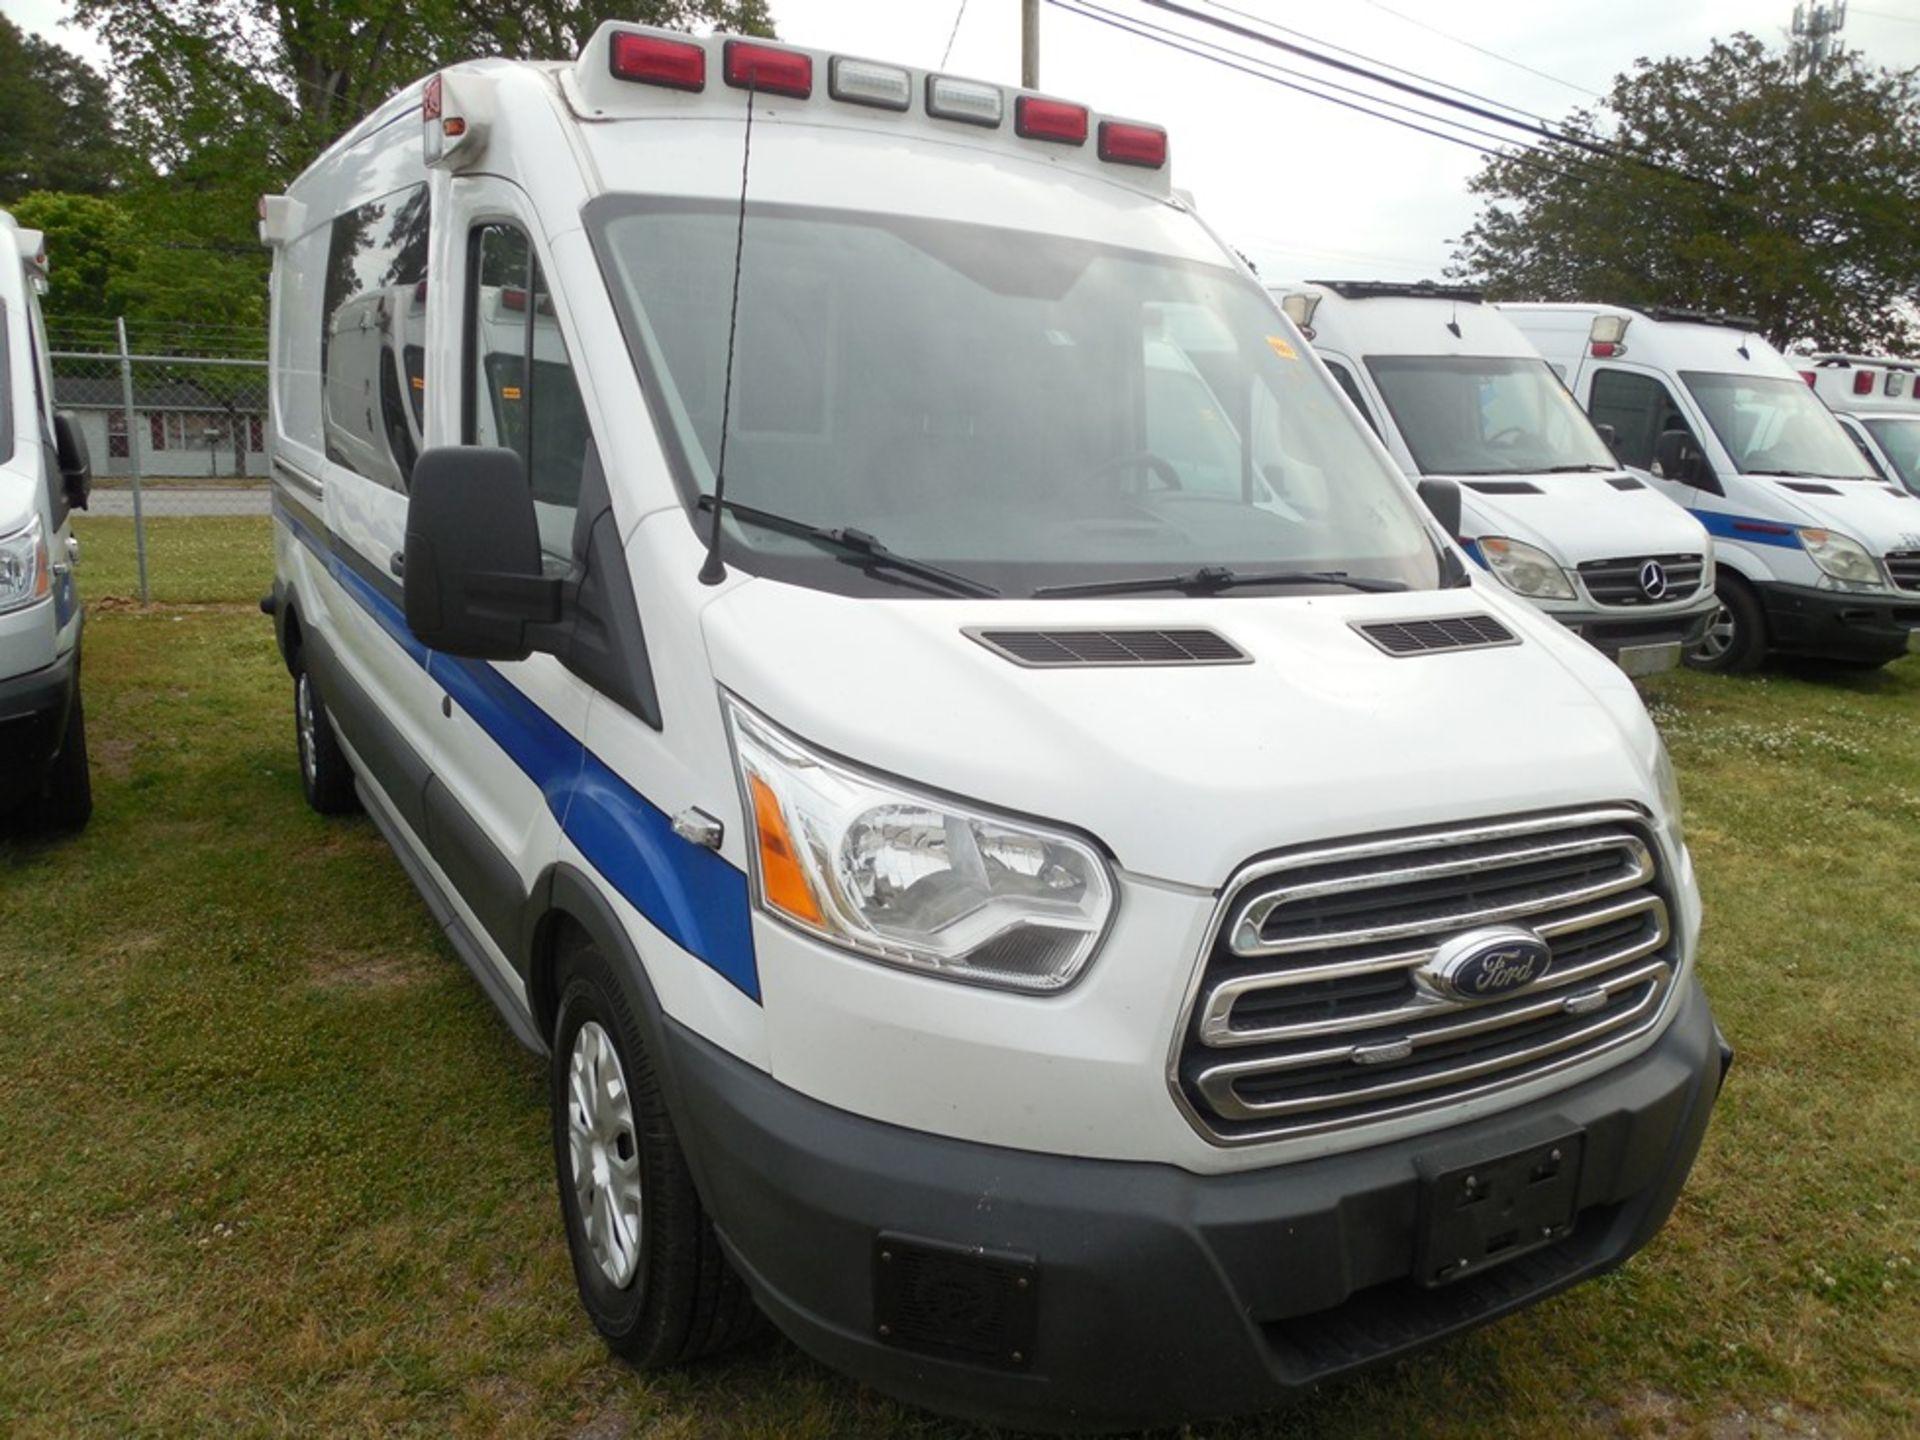 2015 Ford Tansit 250 dsl ambulance 98,714 miles vin# 1FDYR2CV4FKB33641 - Image 3 of 6